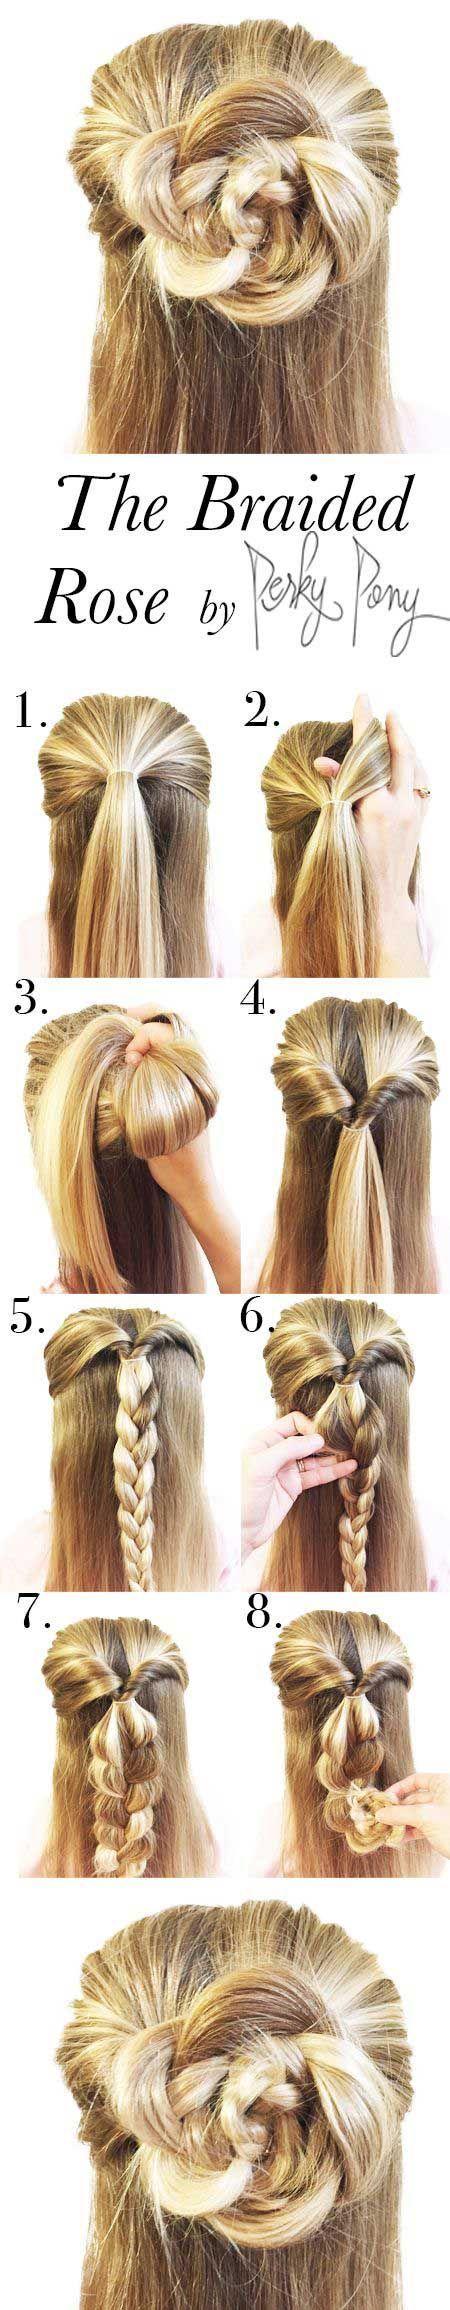 Admirable 1000 Ideas About Down Hairstyles On Pinterest Half Up Half Down Short Hairstyles Gunalazisus